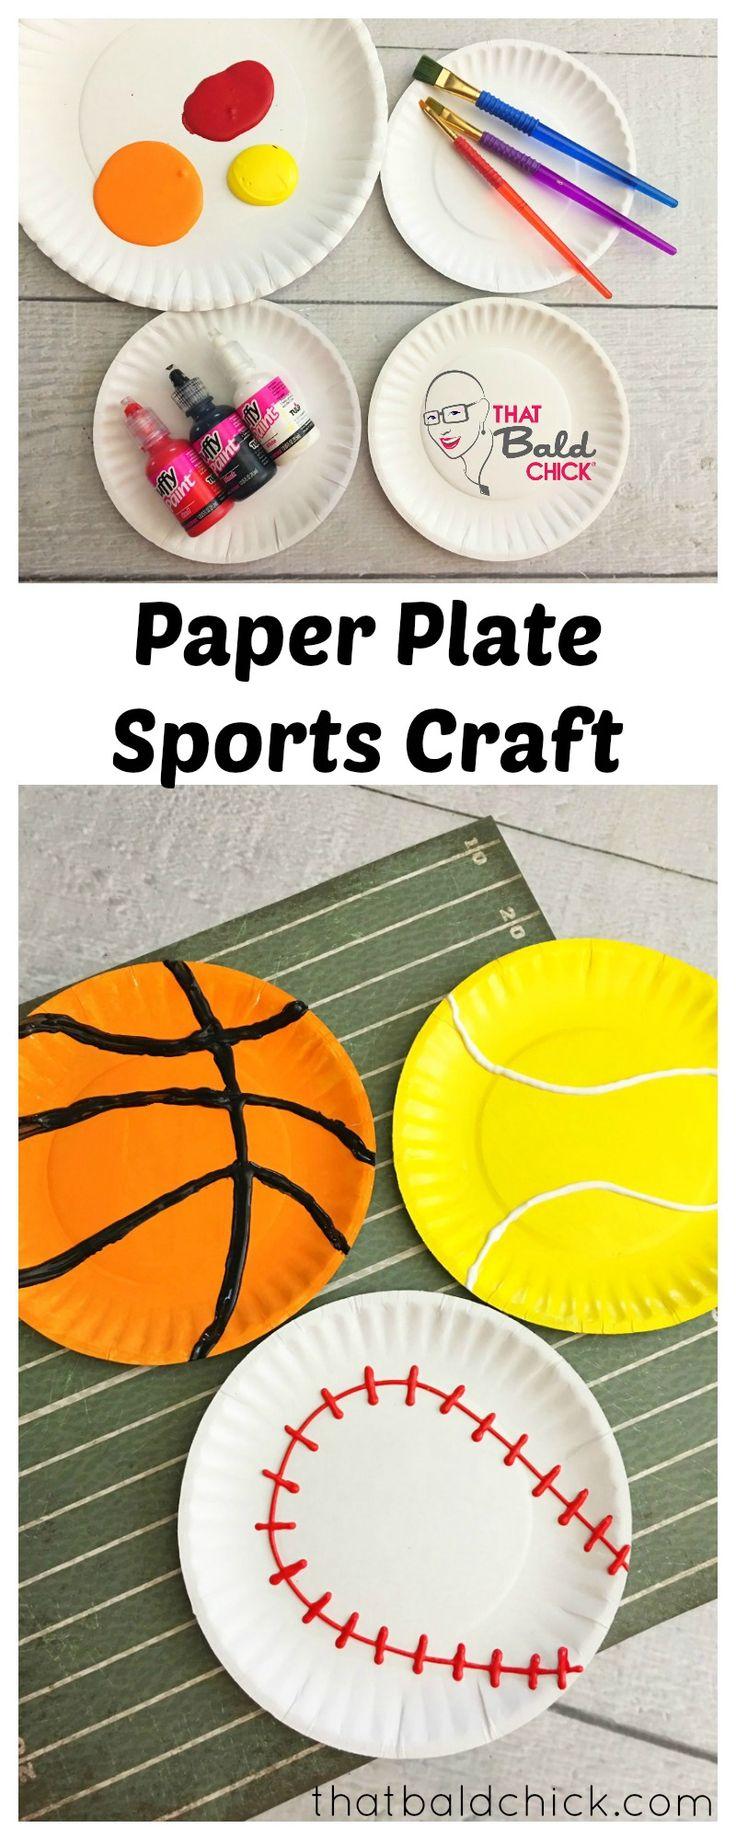 Paper Plate Sports Craft at thatbaldchick.com via @thatbaldchick